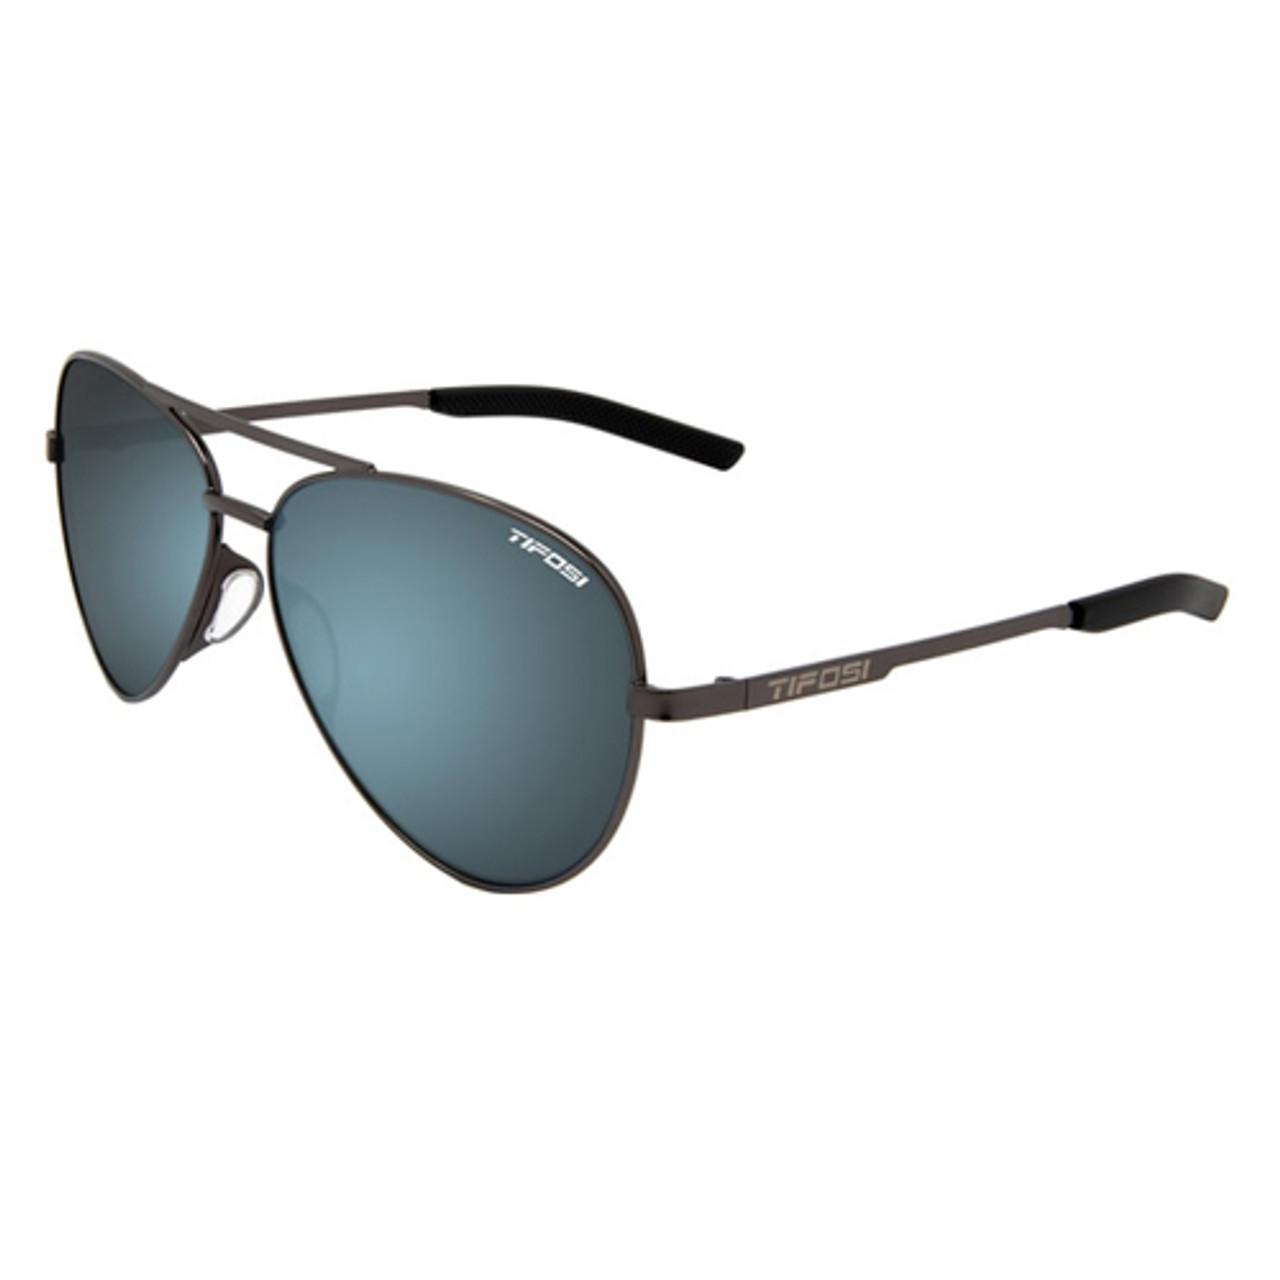 Tifosi Optics Shwae Aviator Sunglasses